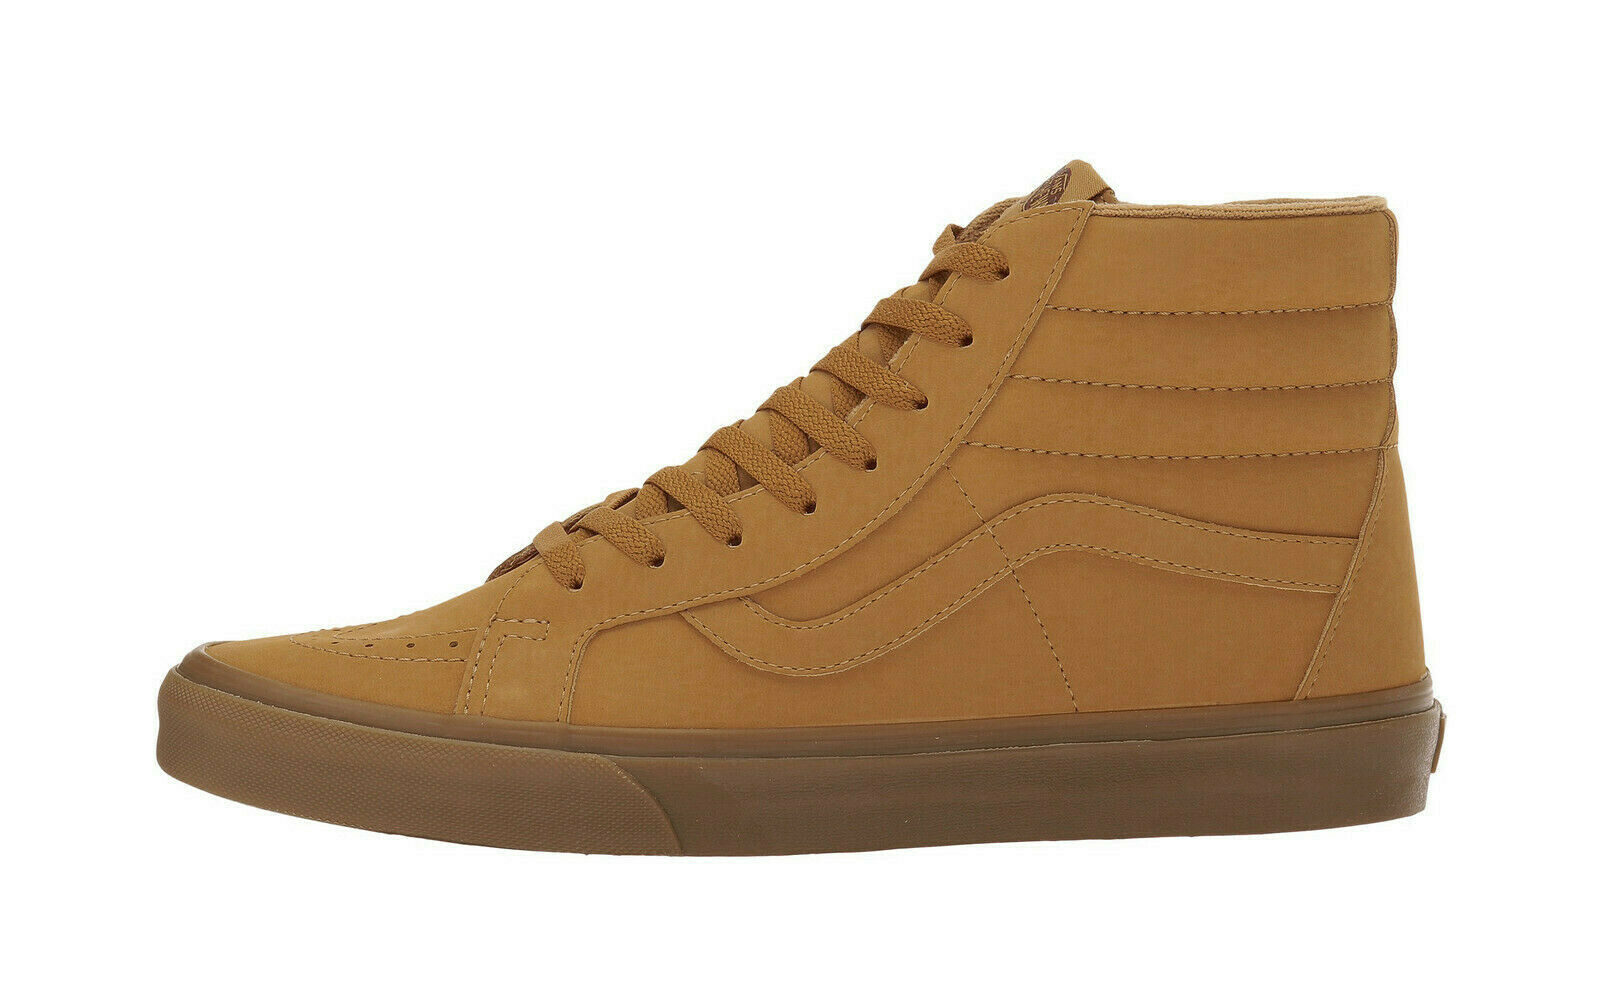 Vans zapatos para hombres SK8 HI Reedición vansbuck Sintético Luz De Goma Mono Trigo